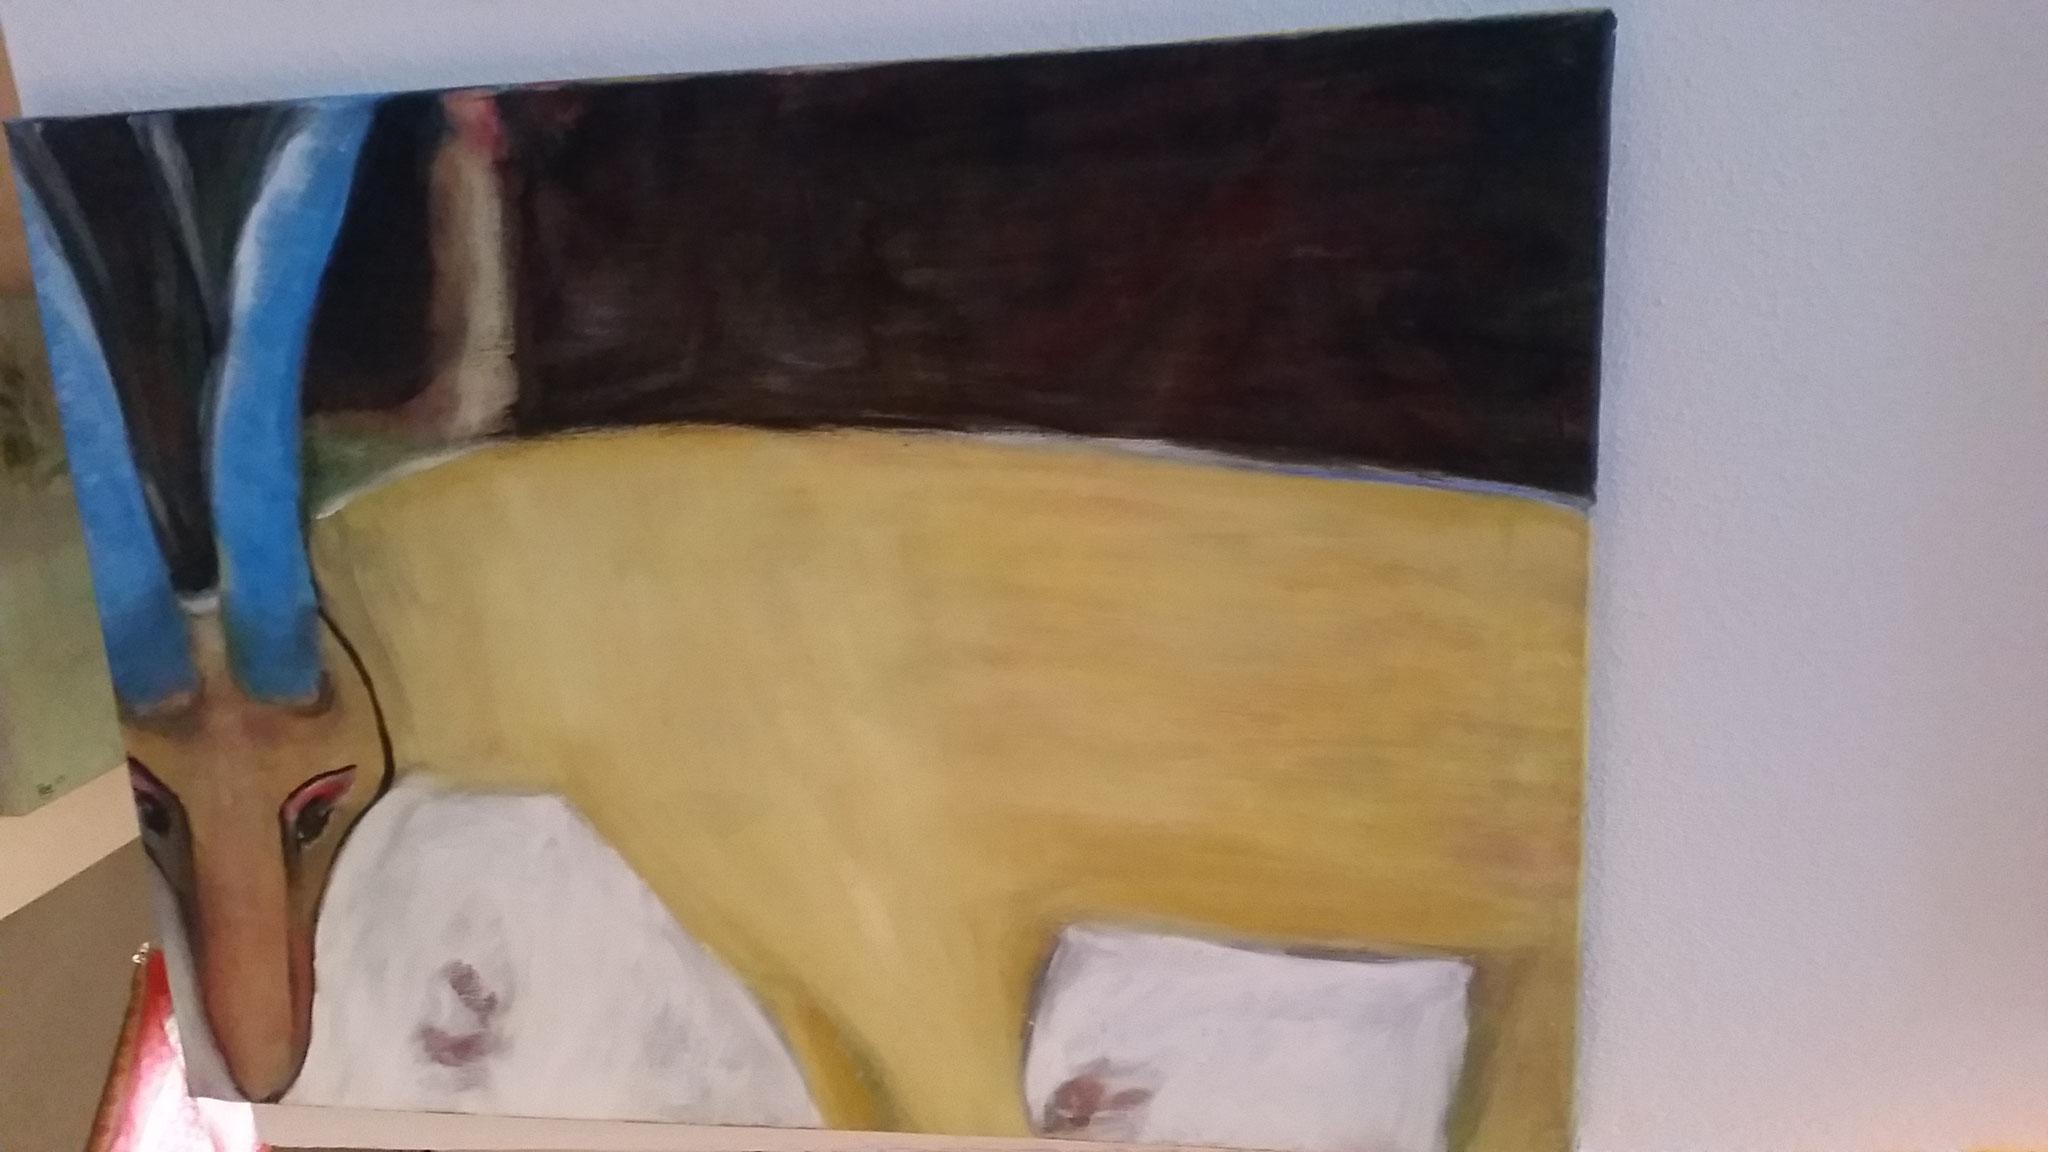 Treppen-Galerie 14, Maler Künstlerin Bozana